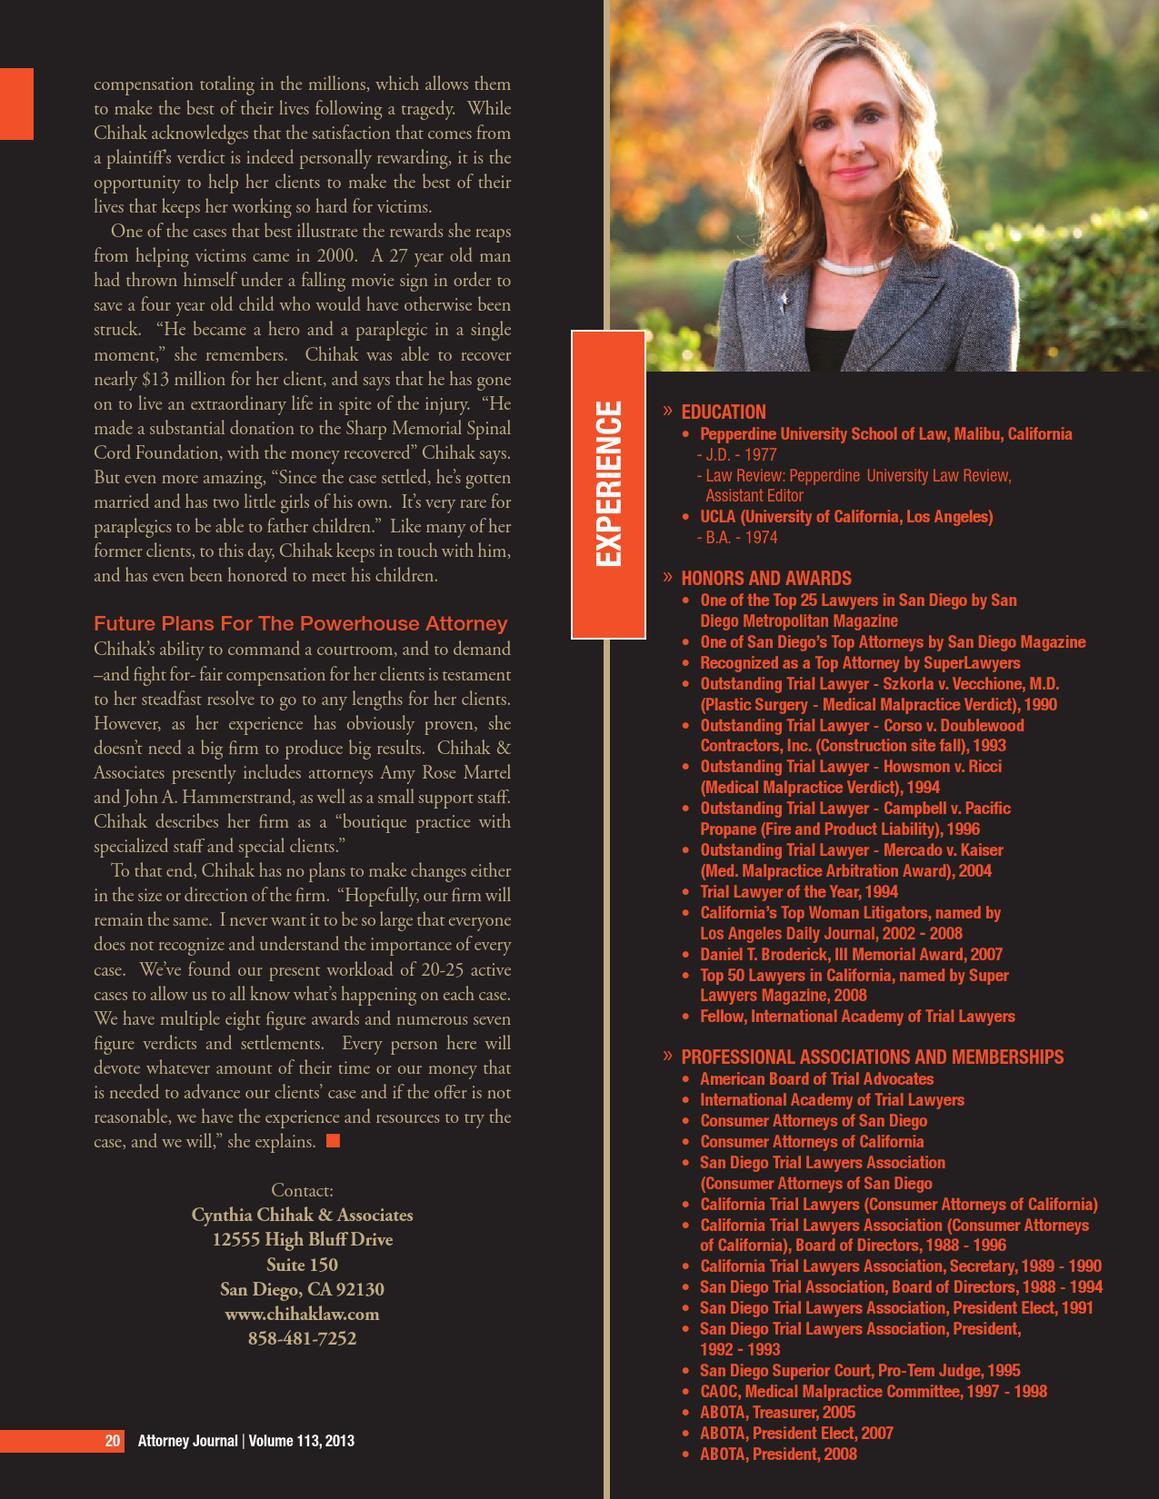 Rachel permuth-levine dissertation